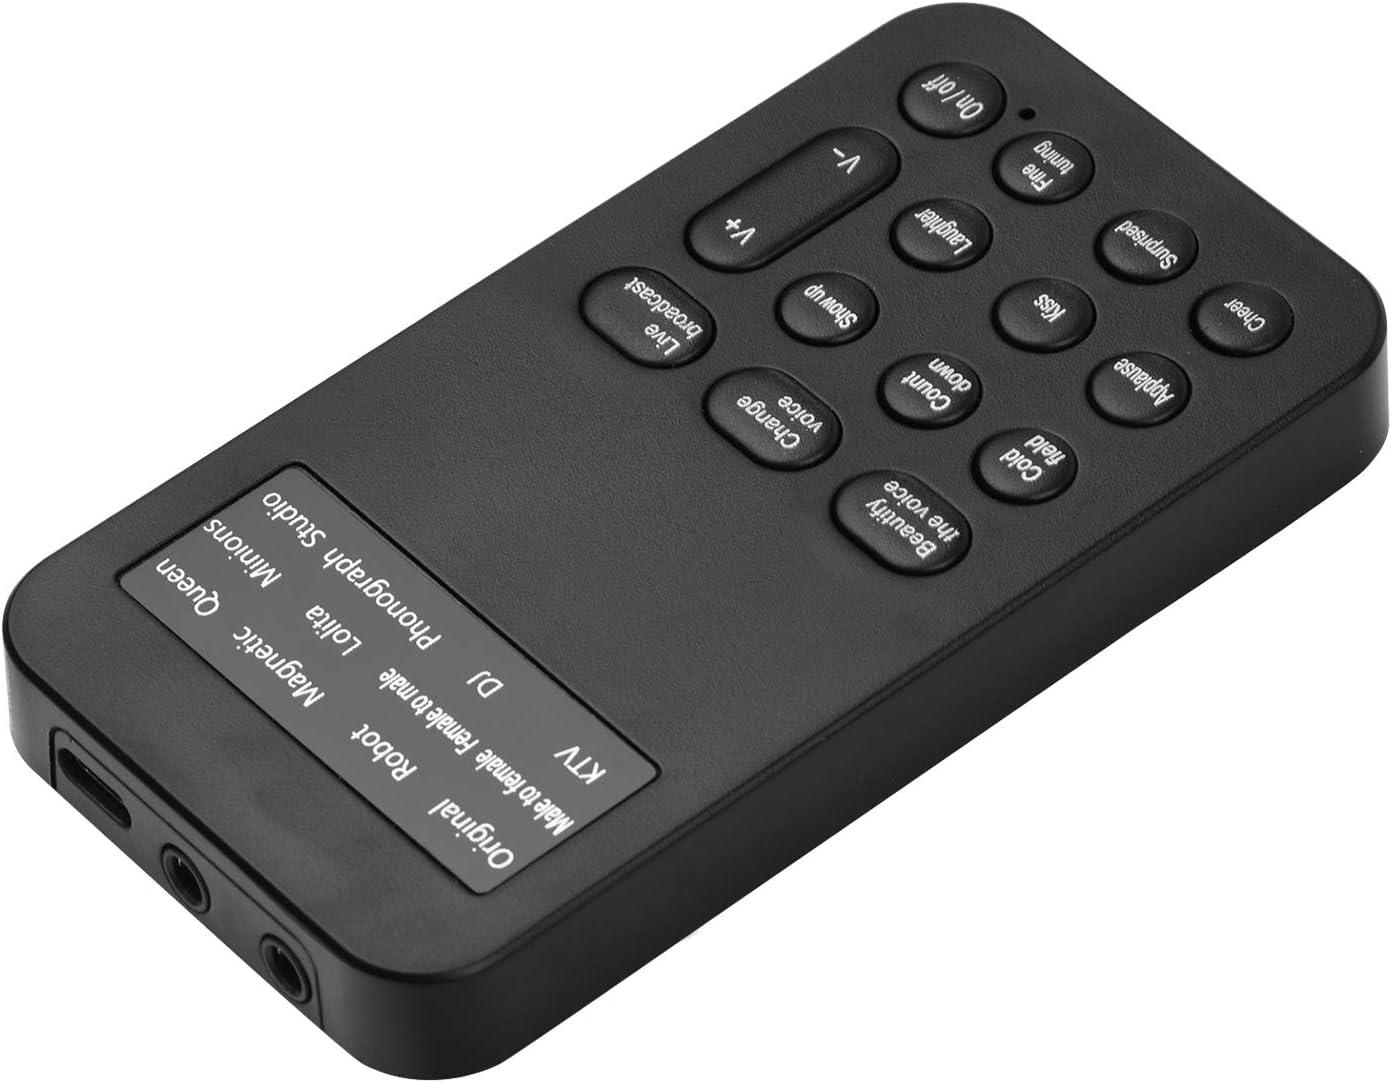 Muslady Mini Dispositivo Cambiador de Voz M/áquina de Efectos de Sonido Micr/ófono Interfaz de 3,5 mm para Transmisi/ón en Vivo Chat en L/ínea Juego de Canto para Tel/éfono Inteligente Tableta